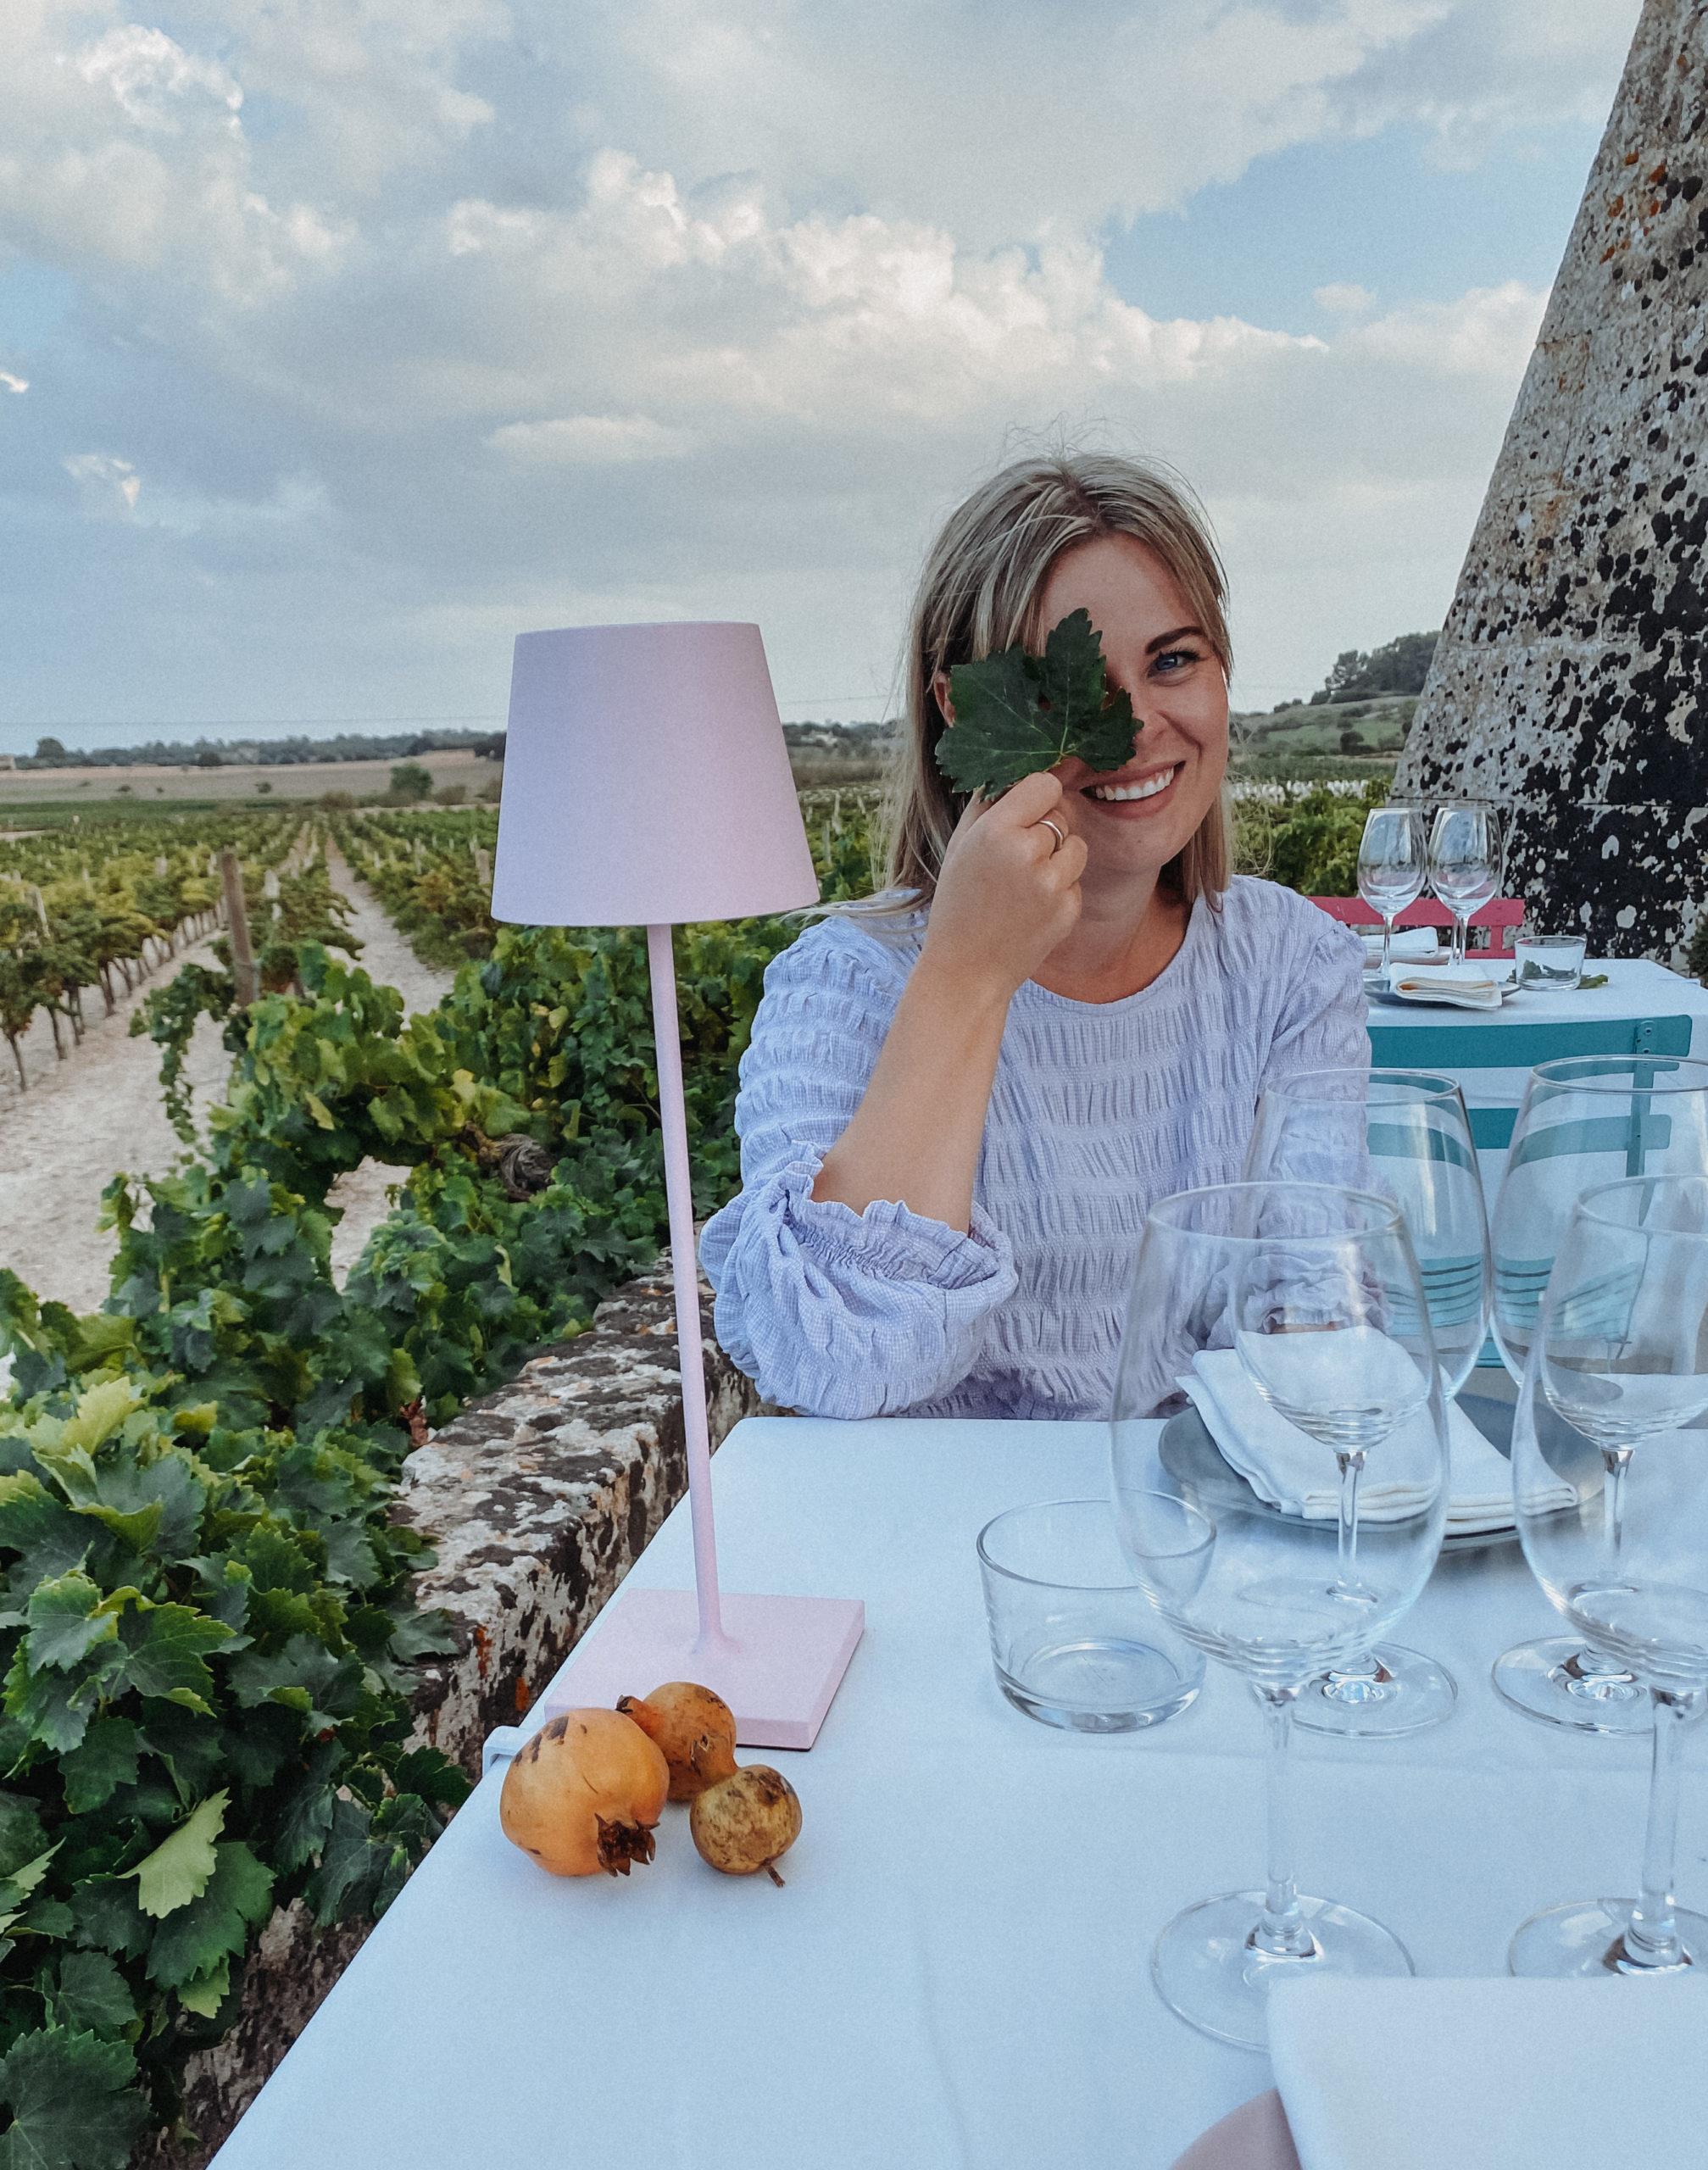 mesquida mora restaurant - wijngaard mallorca - diner op een wijngaard - mesquida mora wijnen - bijzonder restaurant mallorca -